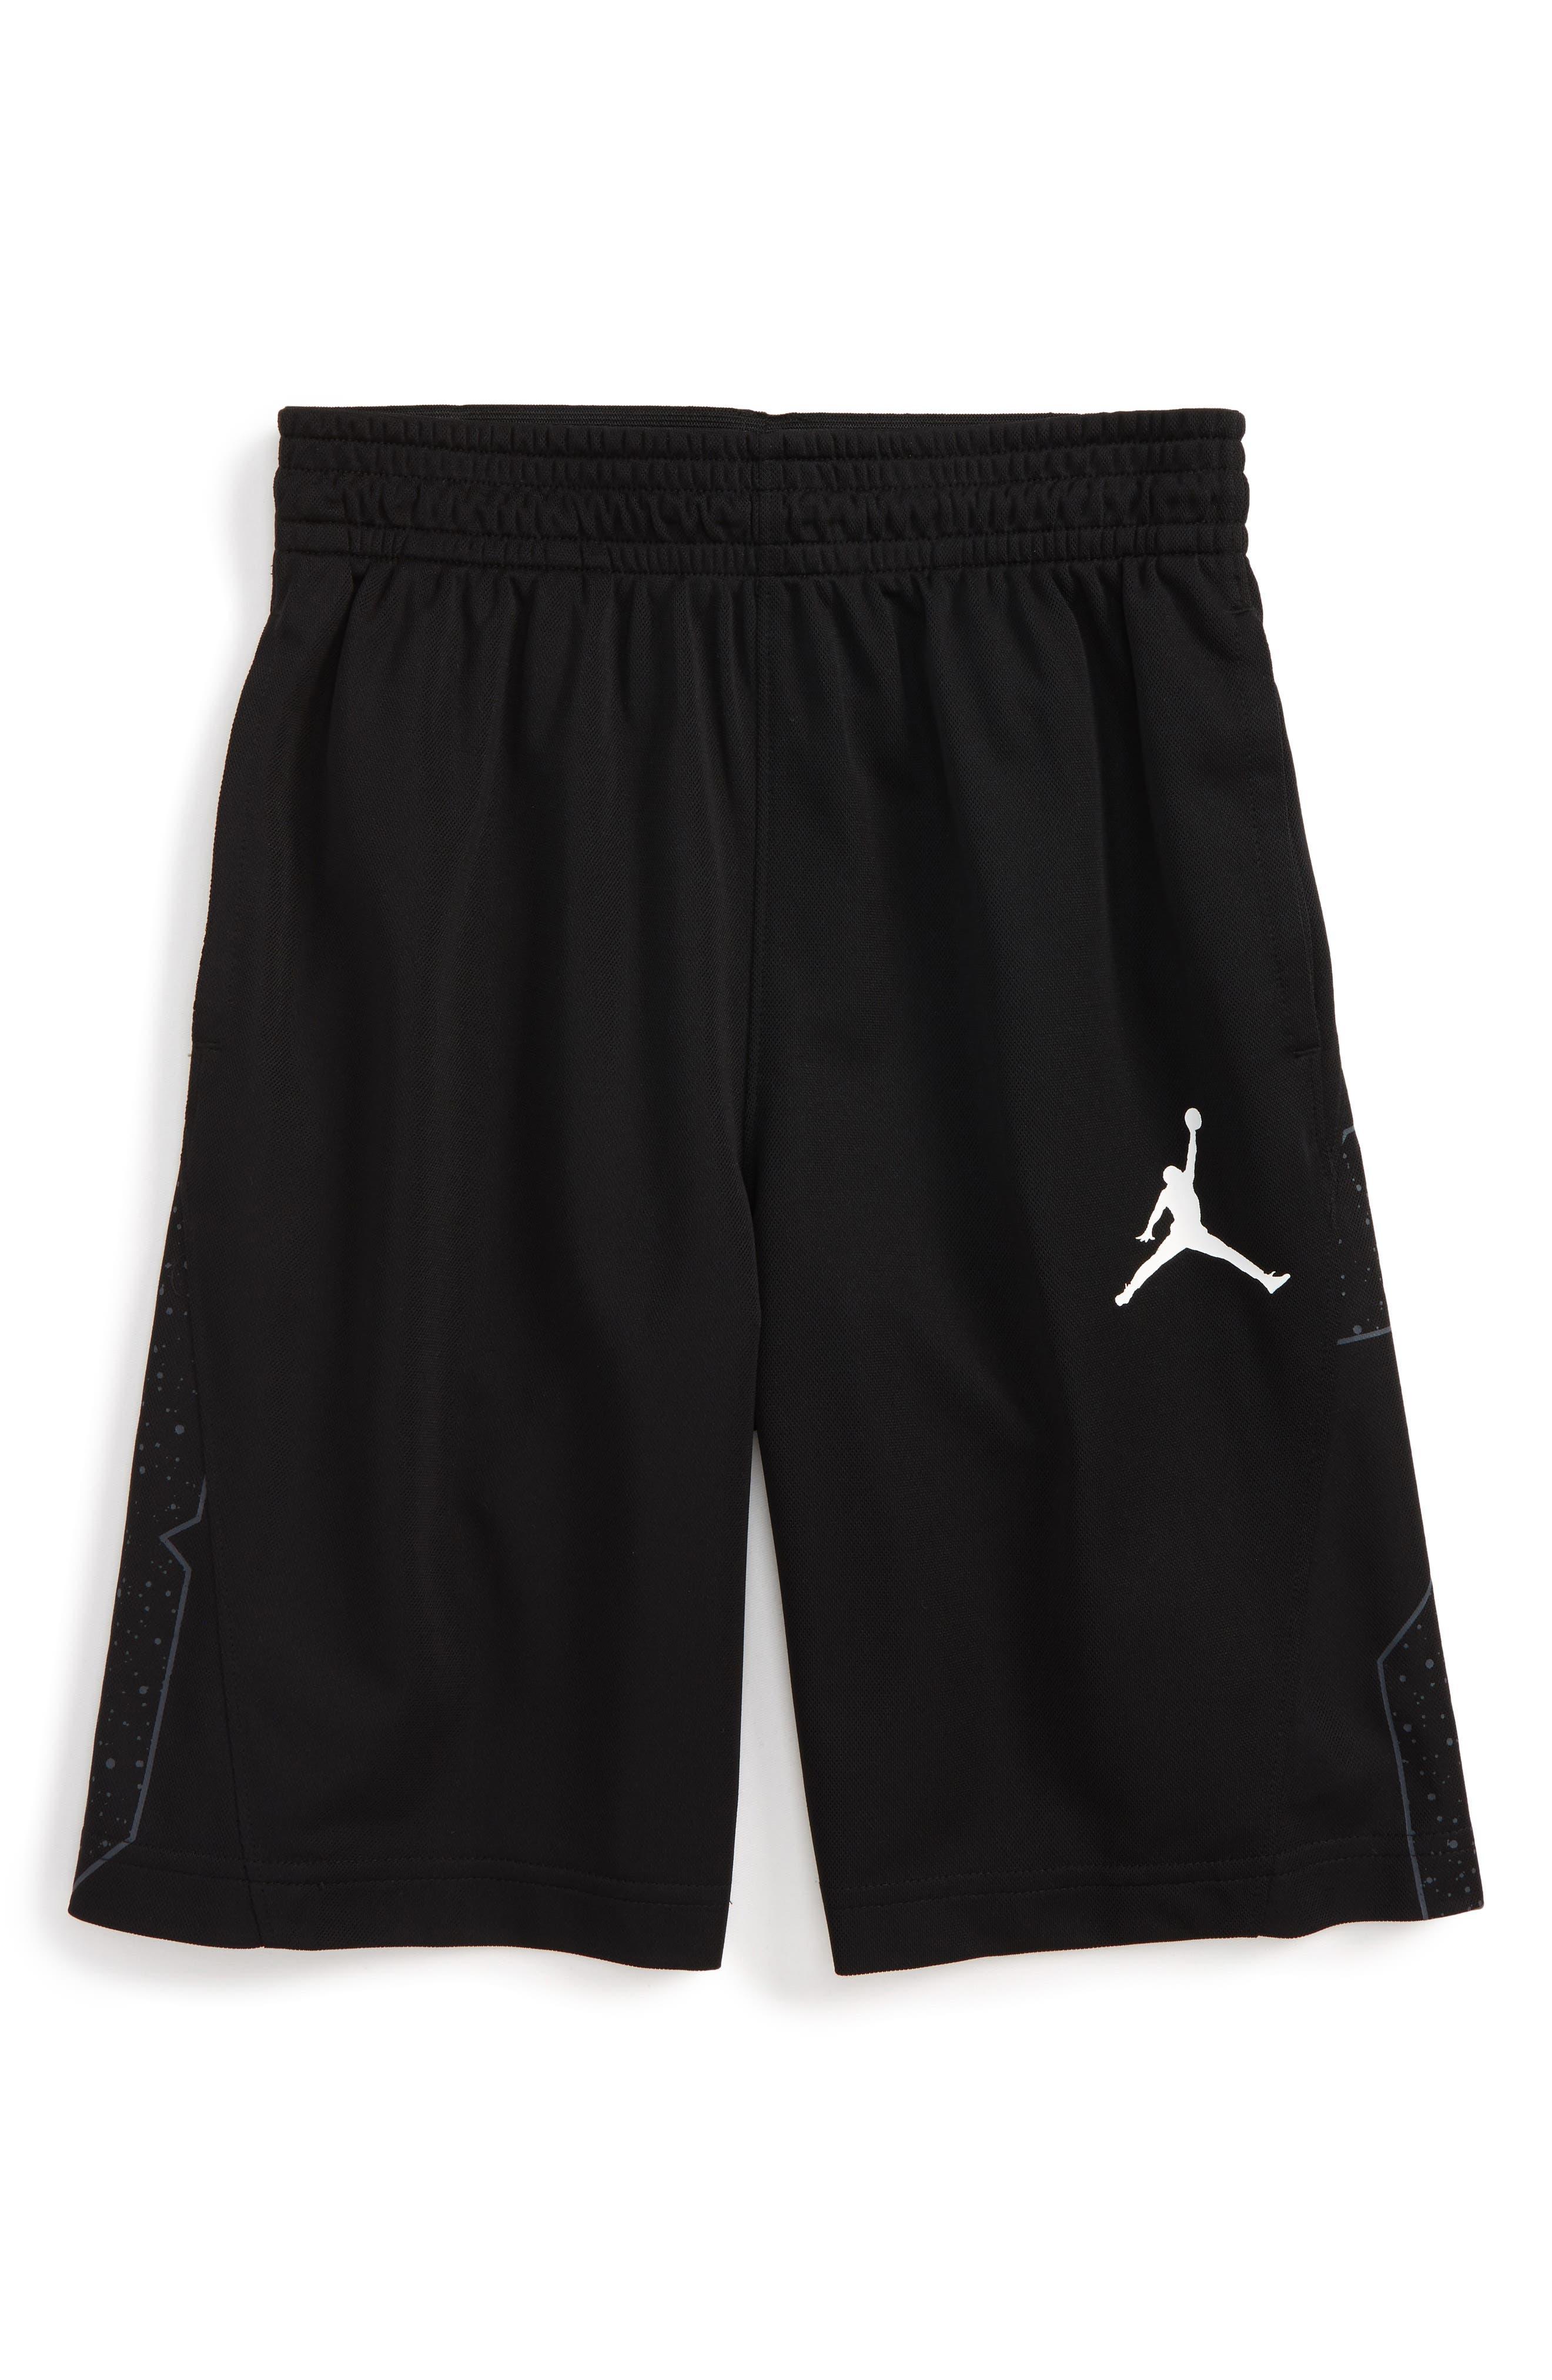 Jordan Speckle 23 Basketball Shorts,                         Main,                         color, 004